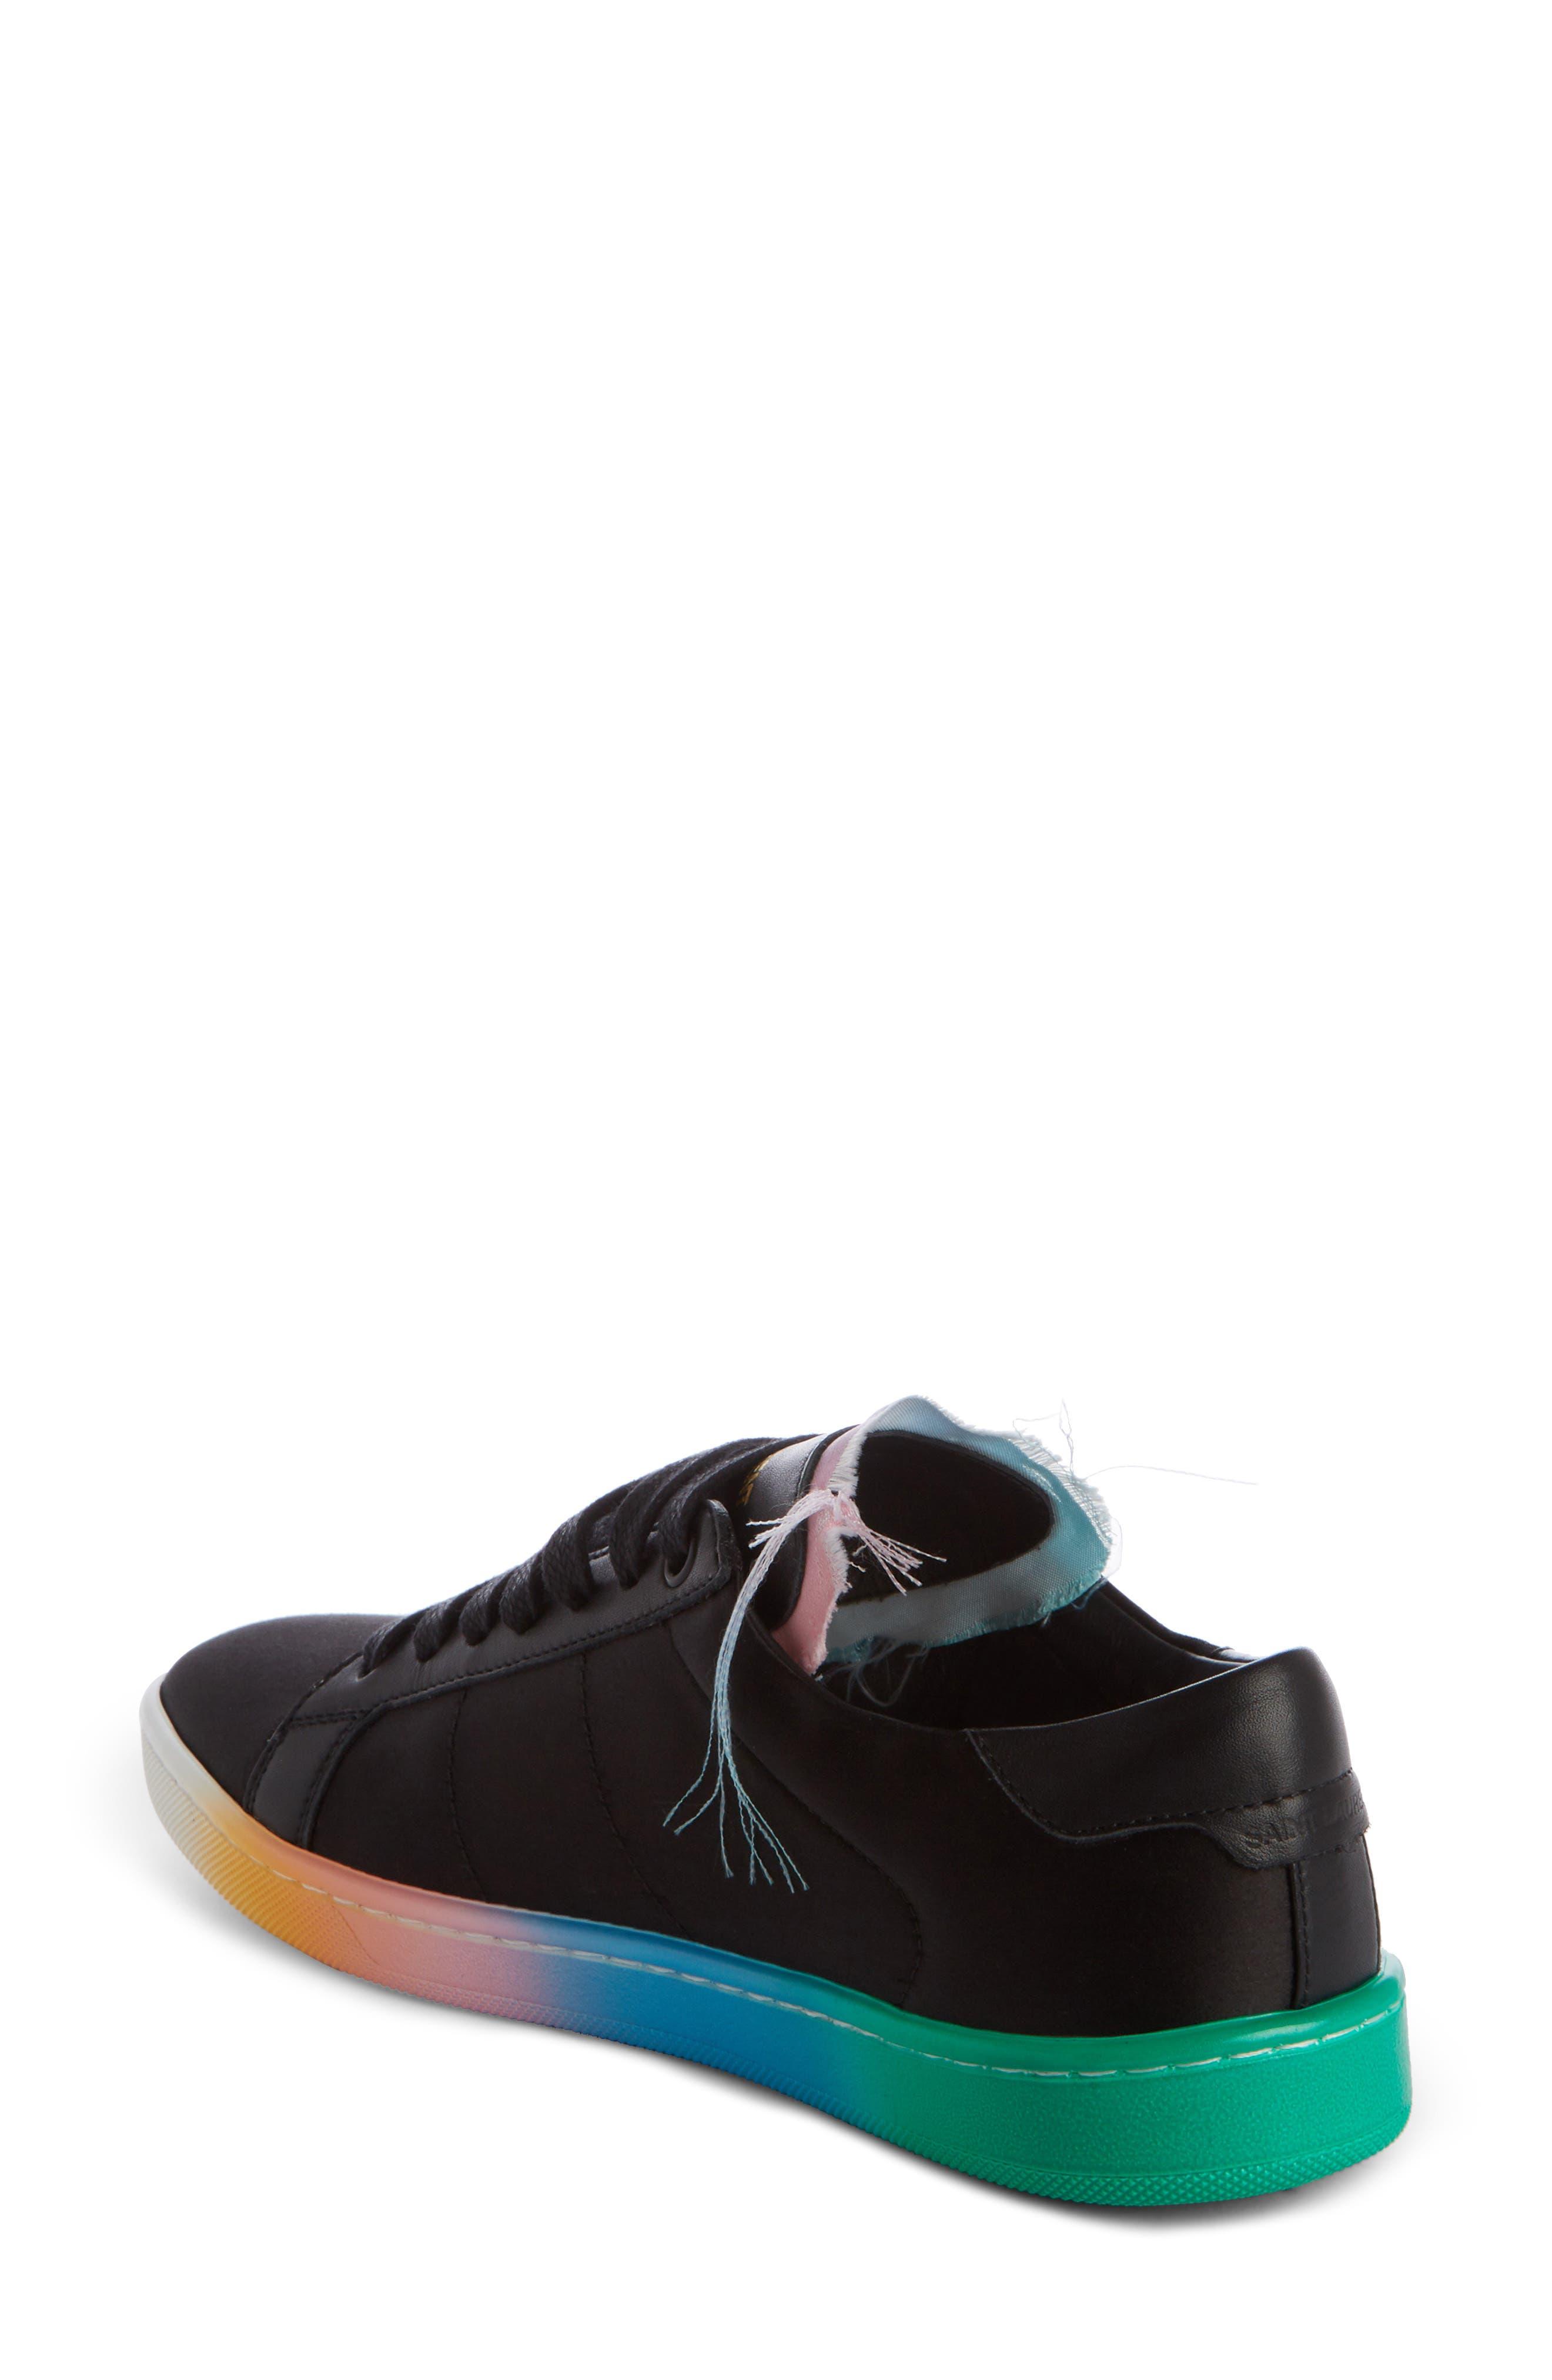 Court Classic Rainbow Sole Sneaker,                             Alternate thumbnail 2, color,                             Black Multi